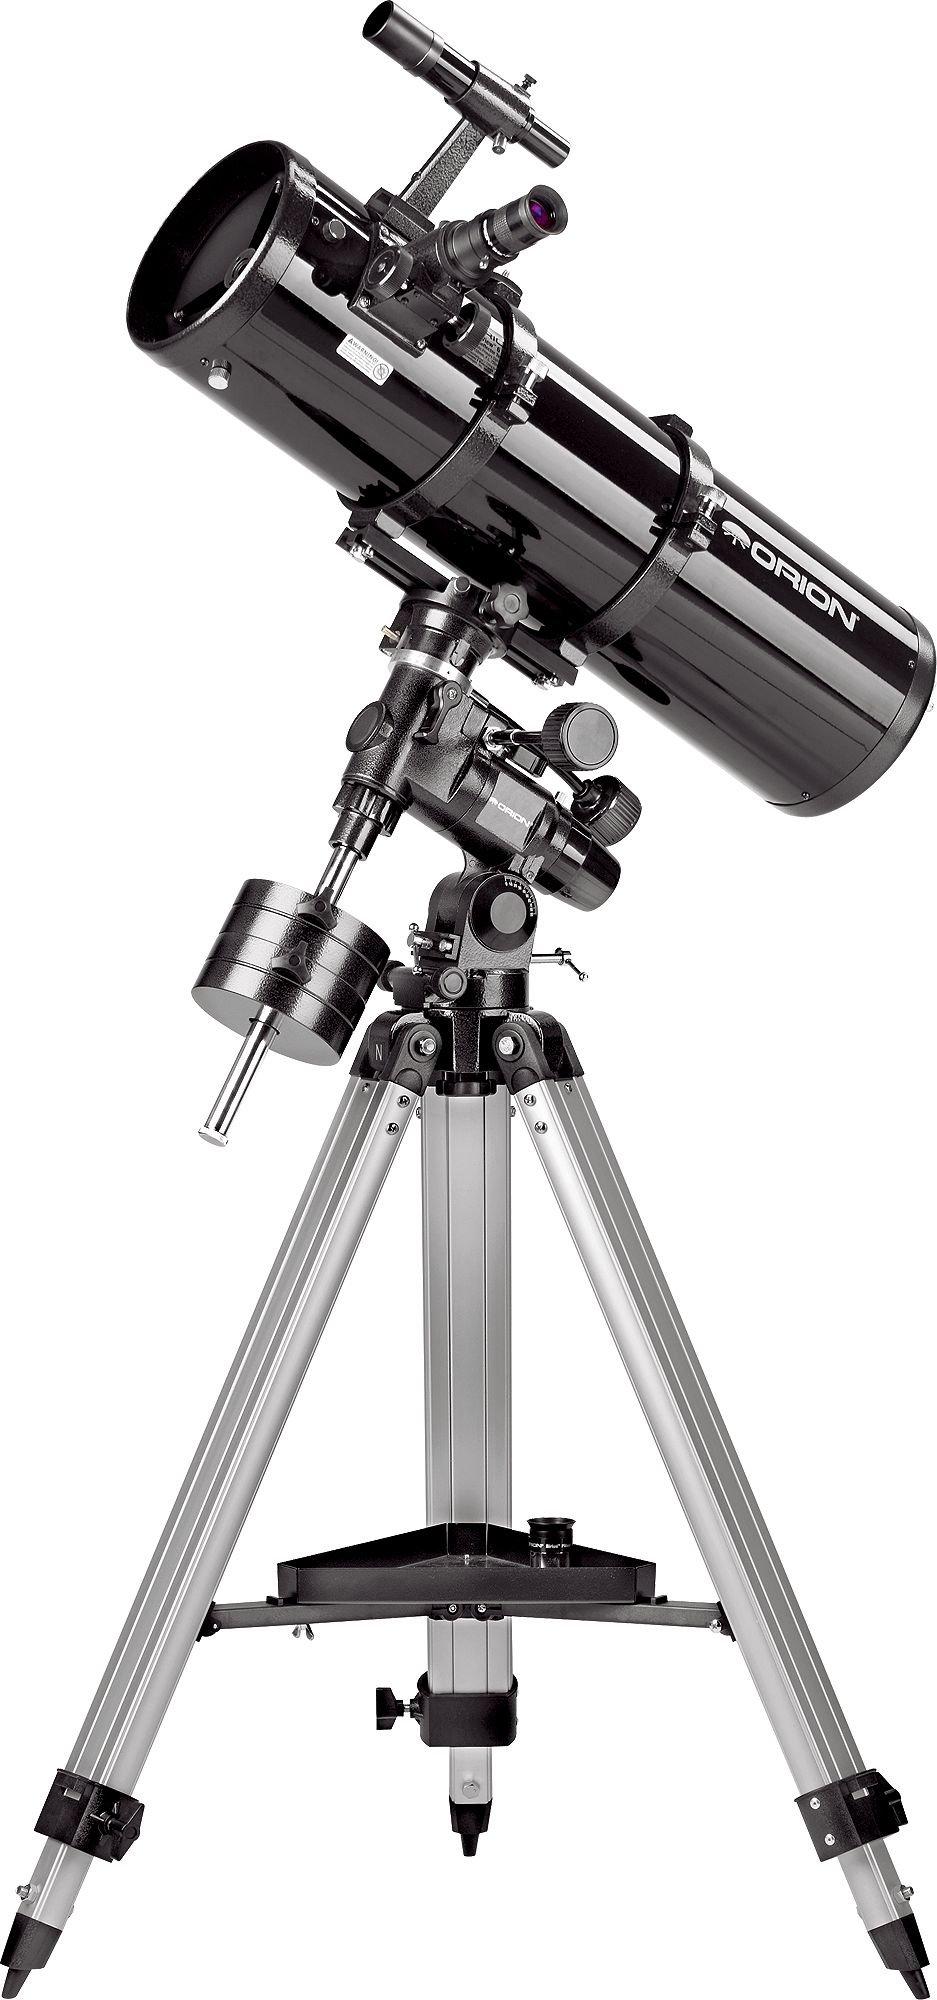 Orion AstroView 6 Equatorial Reflector Telescope